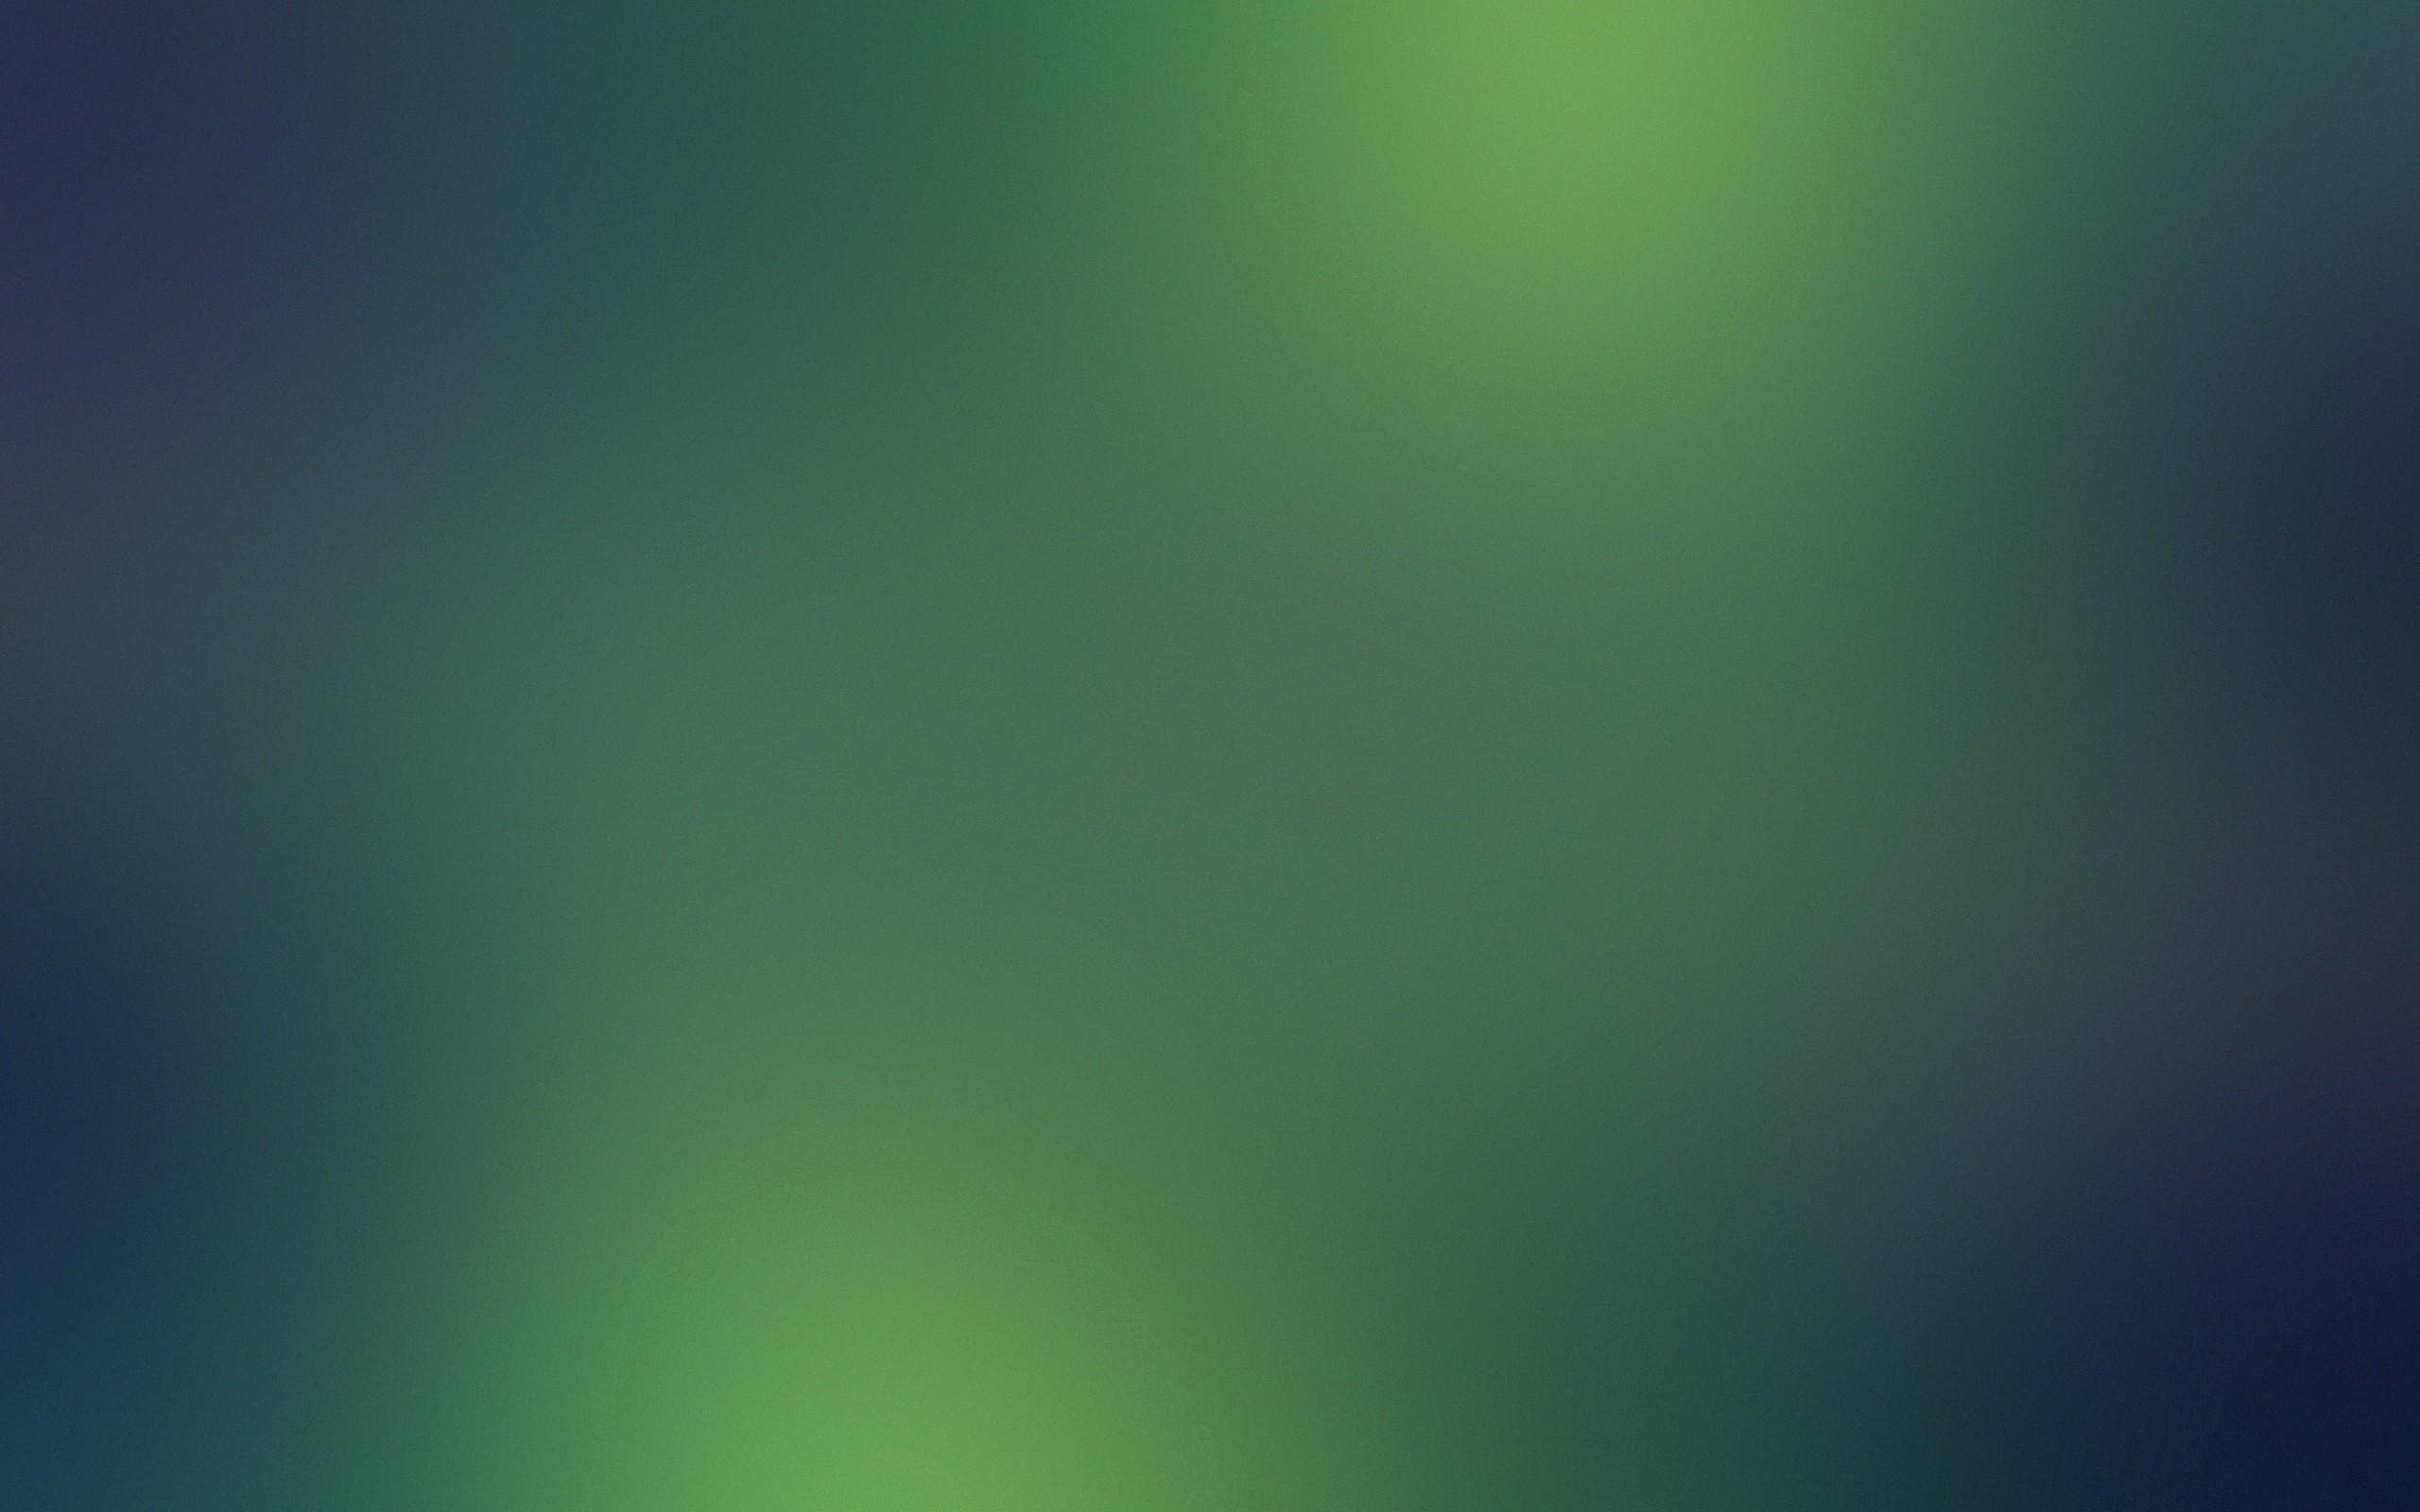 Wallpaper : sunlight, minimalism, sky, green, simple ...